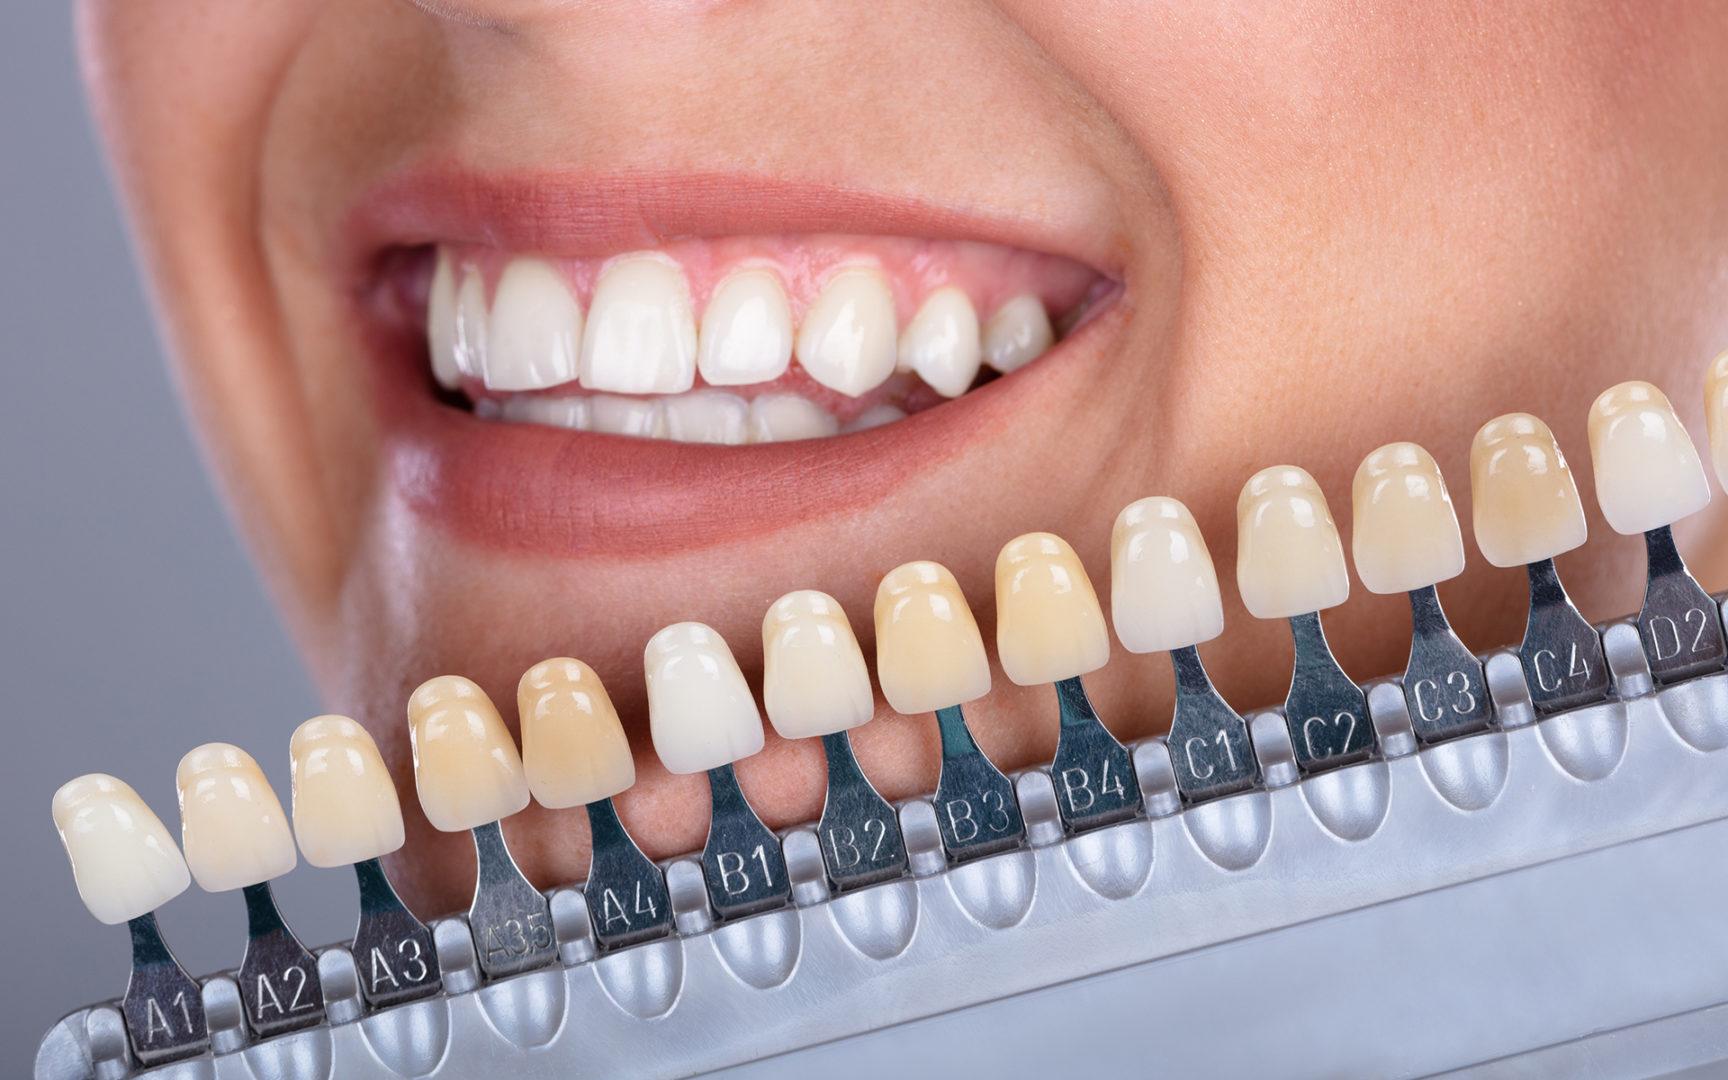 Kenelle hampaiden valkaisu sopii?